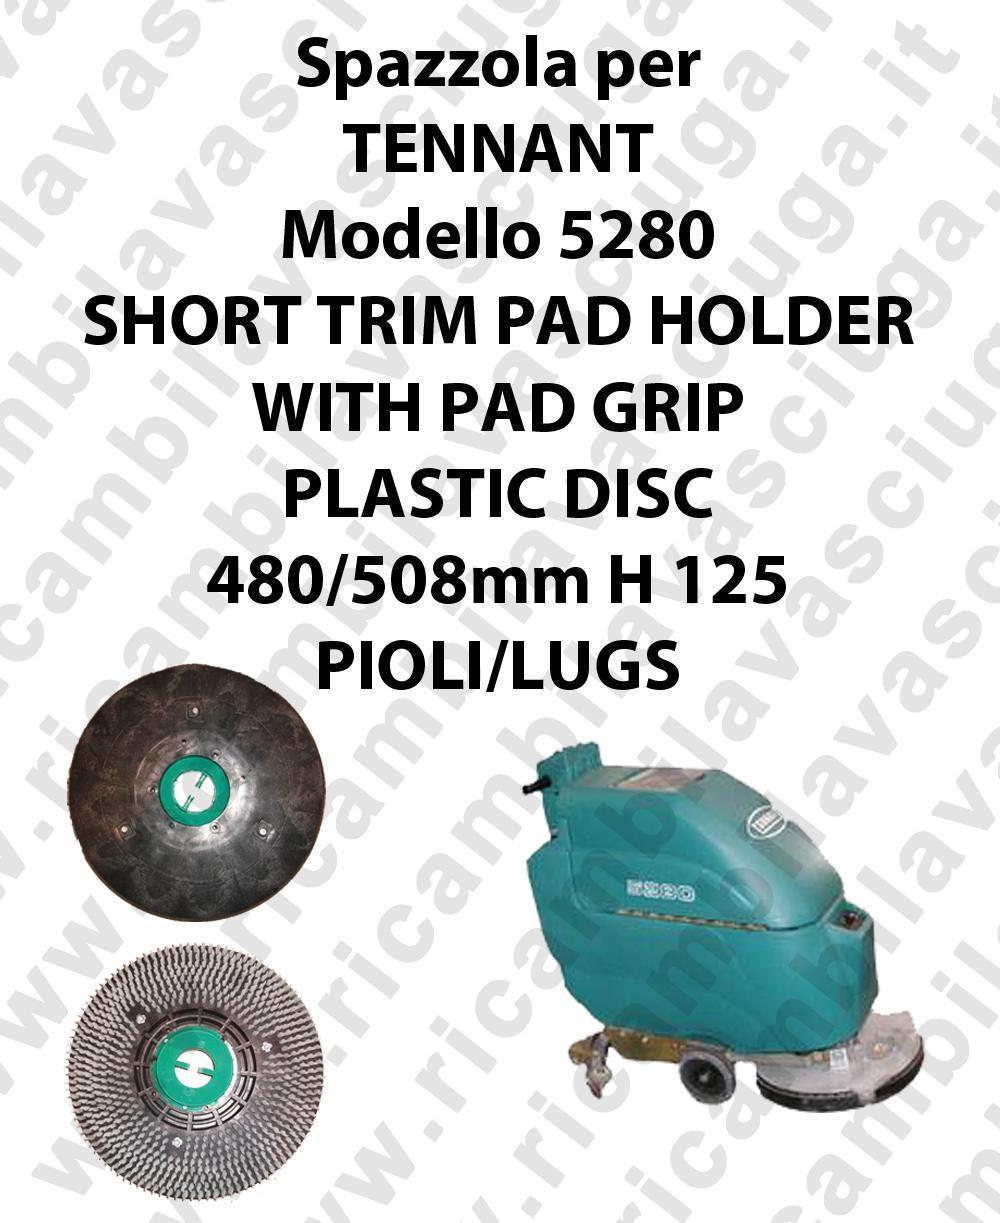 SHORT TRIM PAD HOLDER WITH PAD GRIP para fregadora TENNANT mod 5280